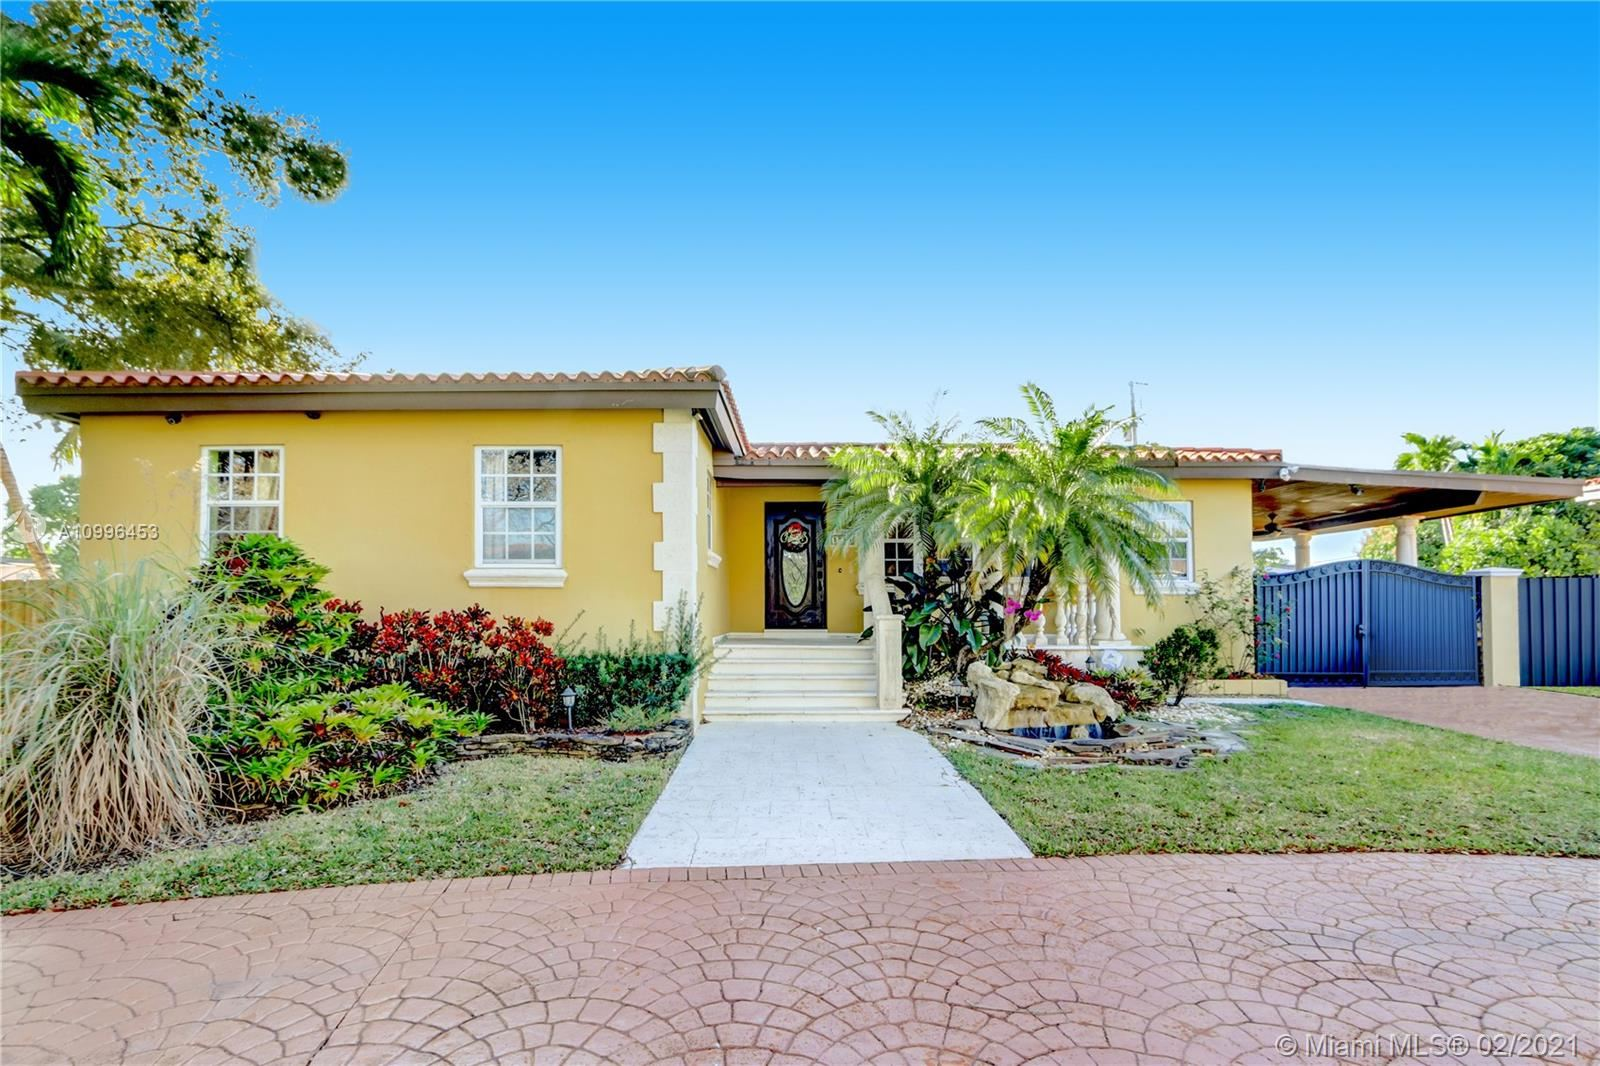 3320 SW 82nd Ave, Miami, FL 33155 - #: A10996453